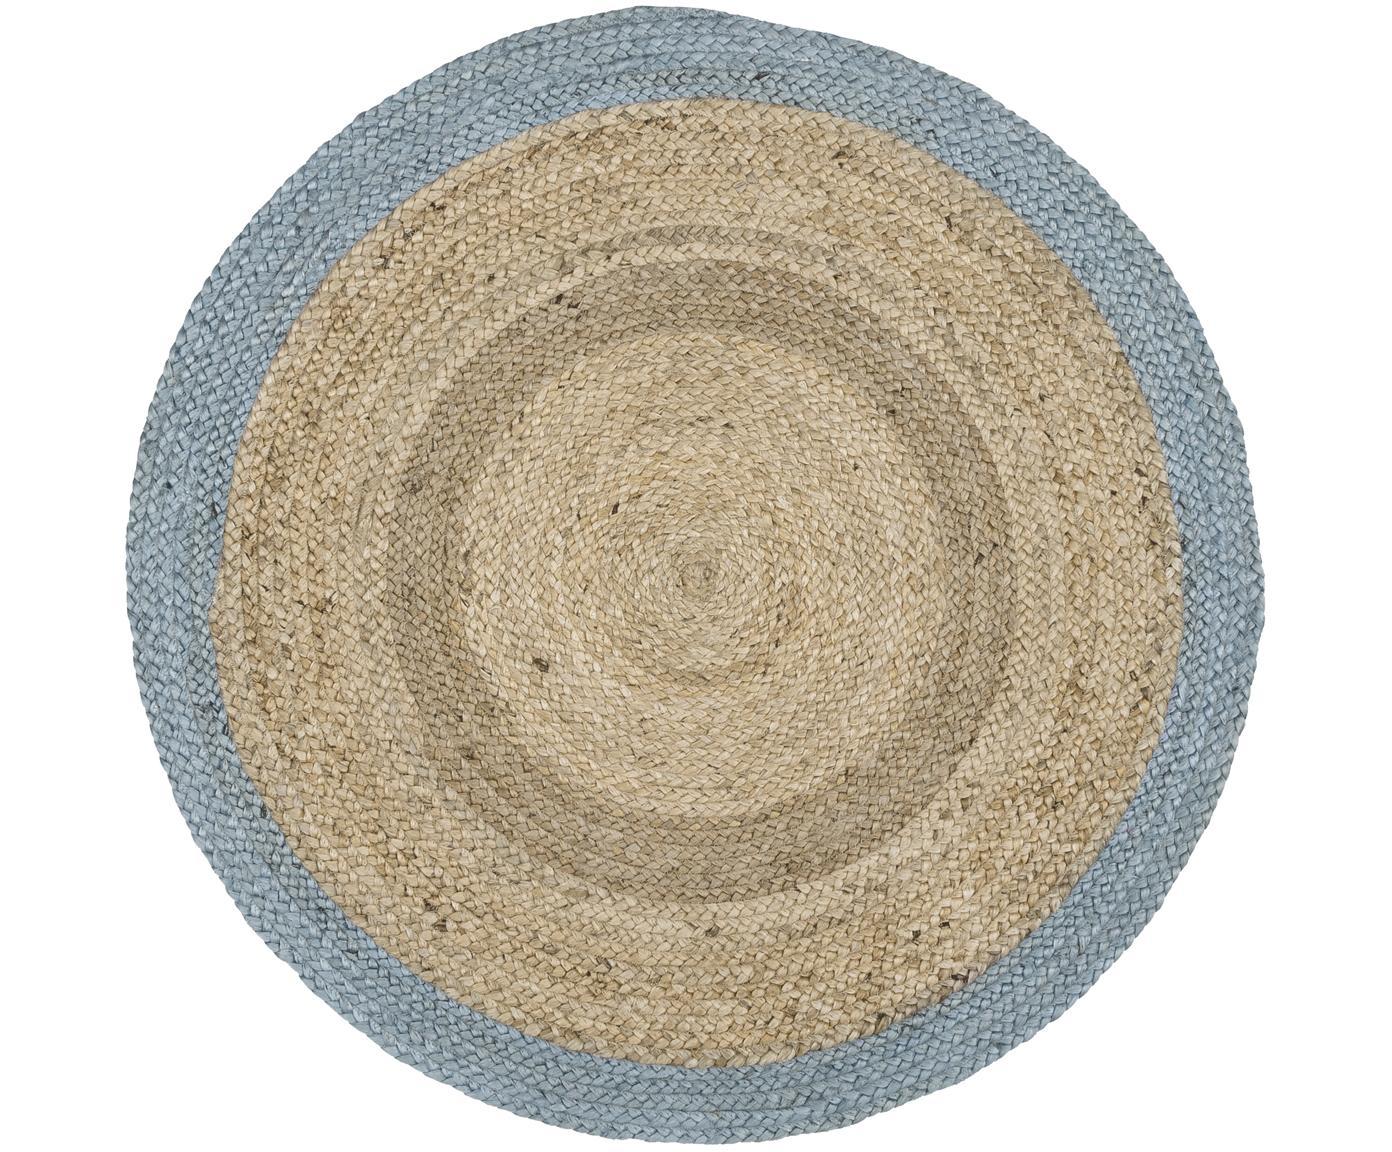 Alfombra redonda artesanal de yute Shanta, Parte superior: yute, Reverso: yute, Yute, gris azulado, Ø 100 cm (Tamaño XS)